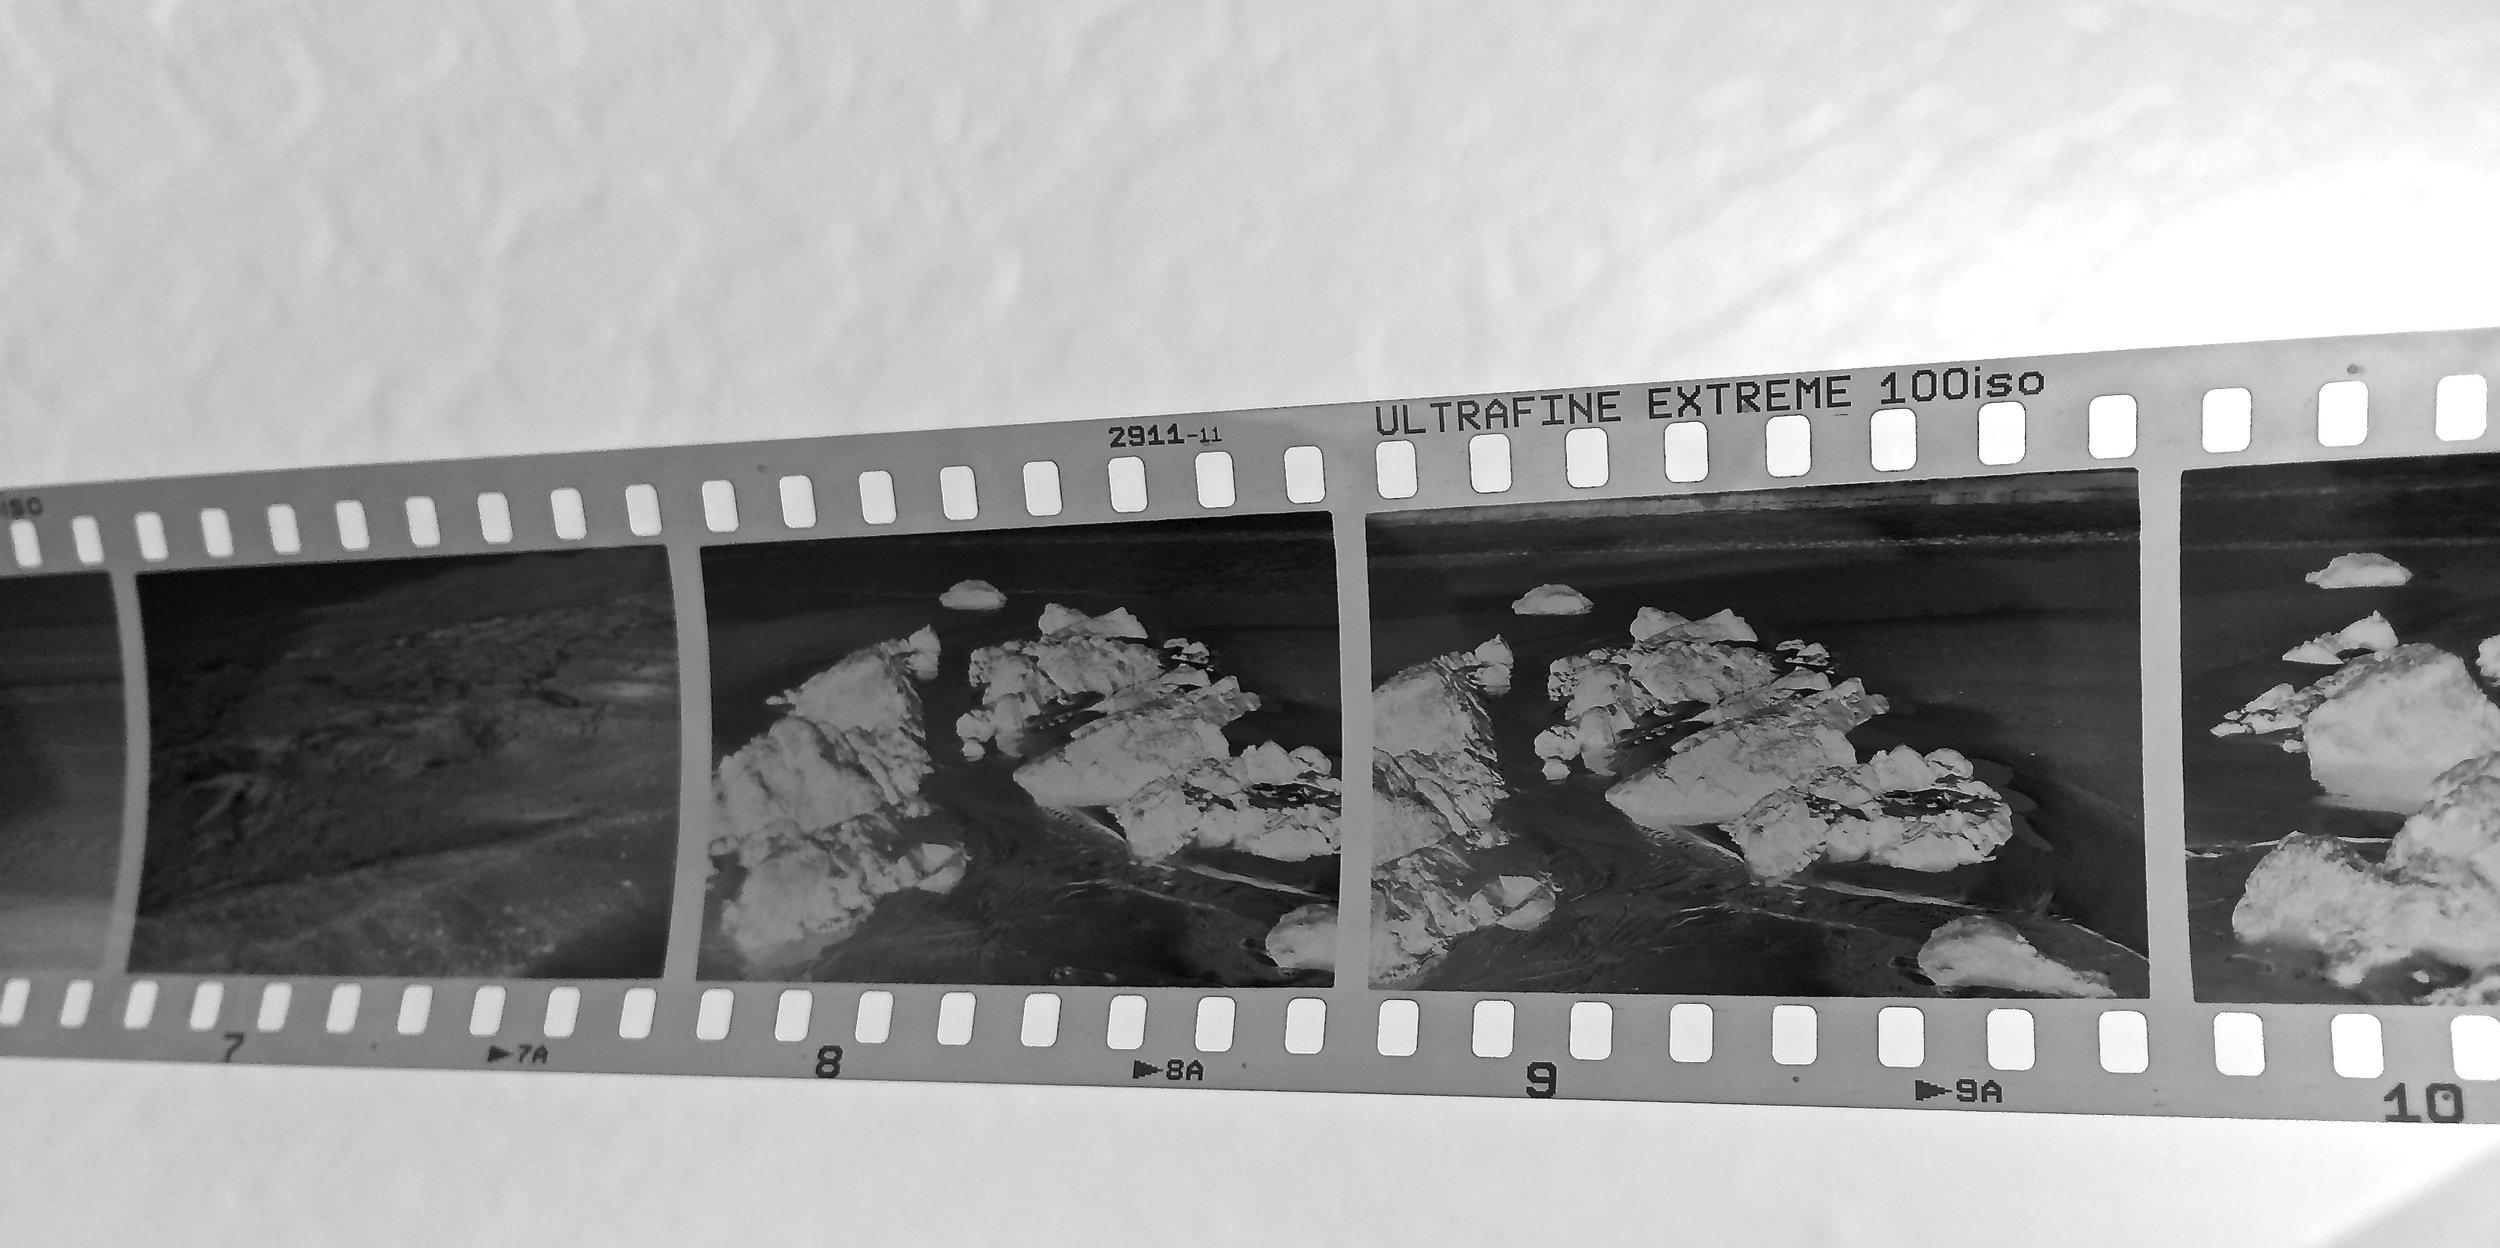 Ultrafine film processed in my kitchen